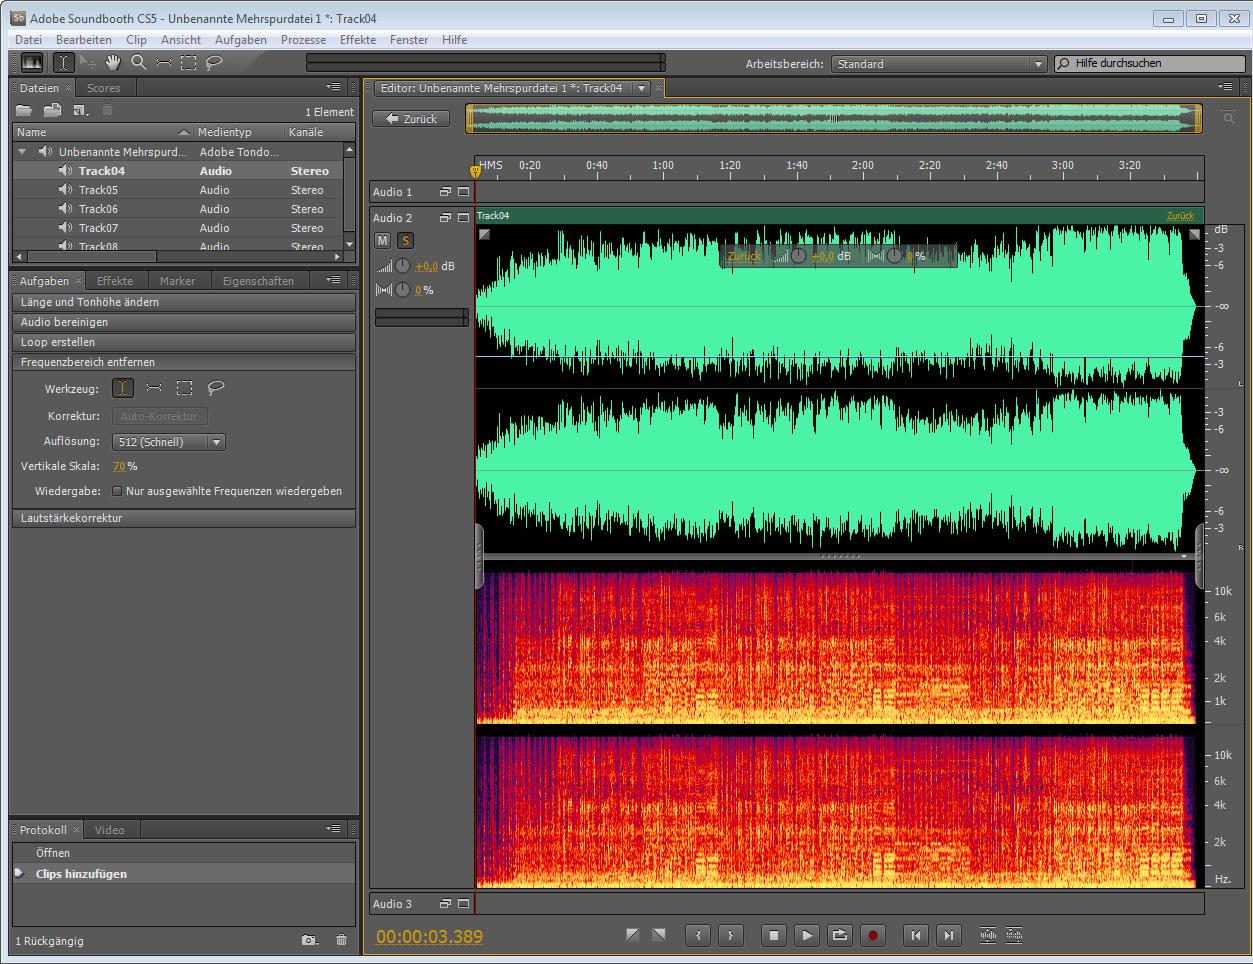 Adobe soundbooth cs5 great deals